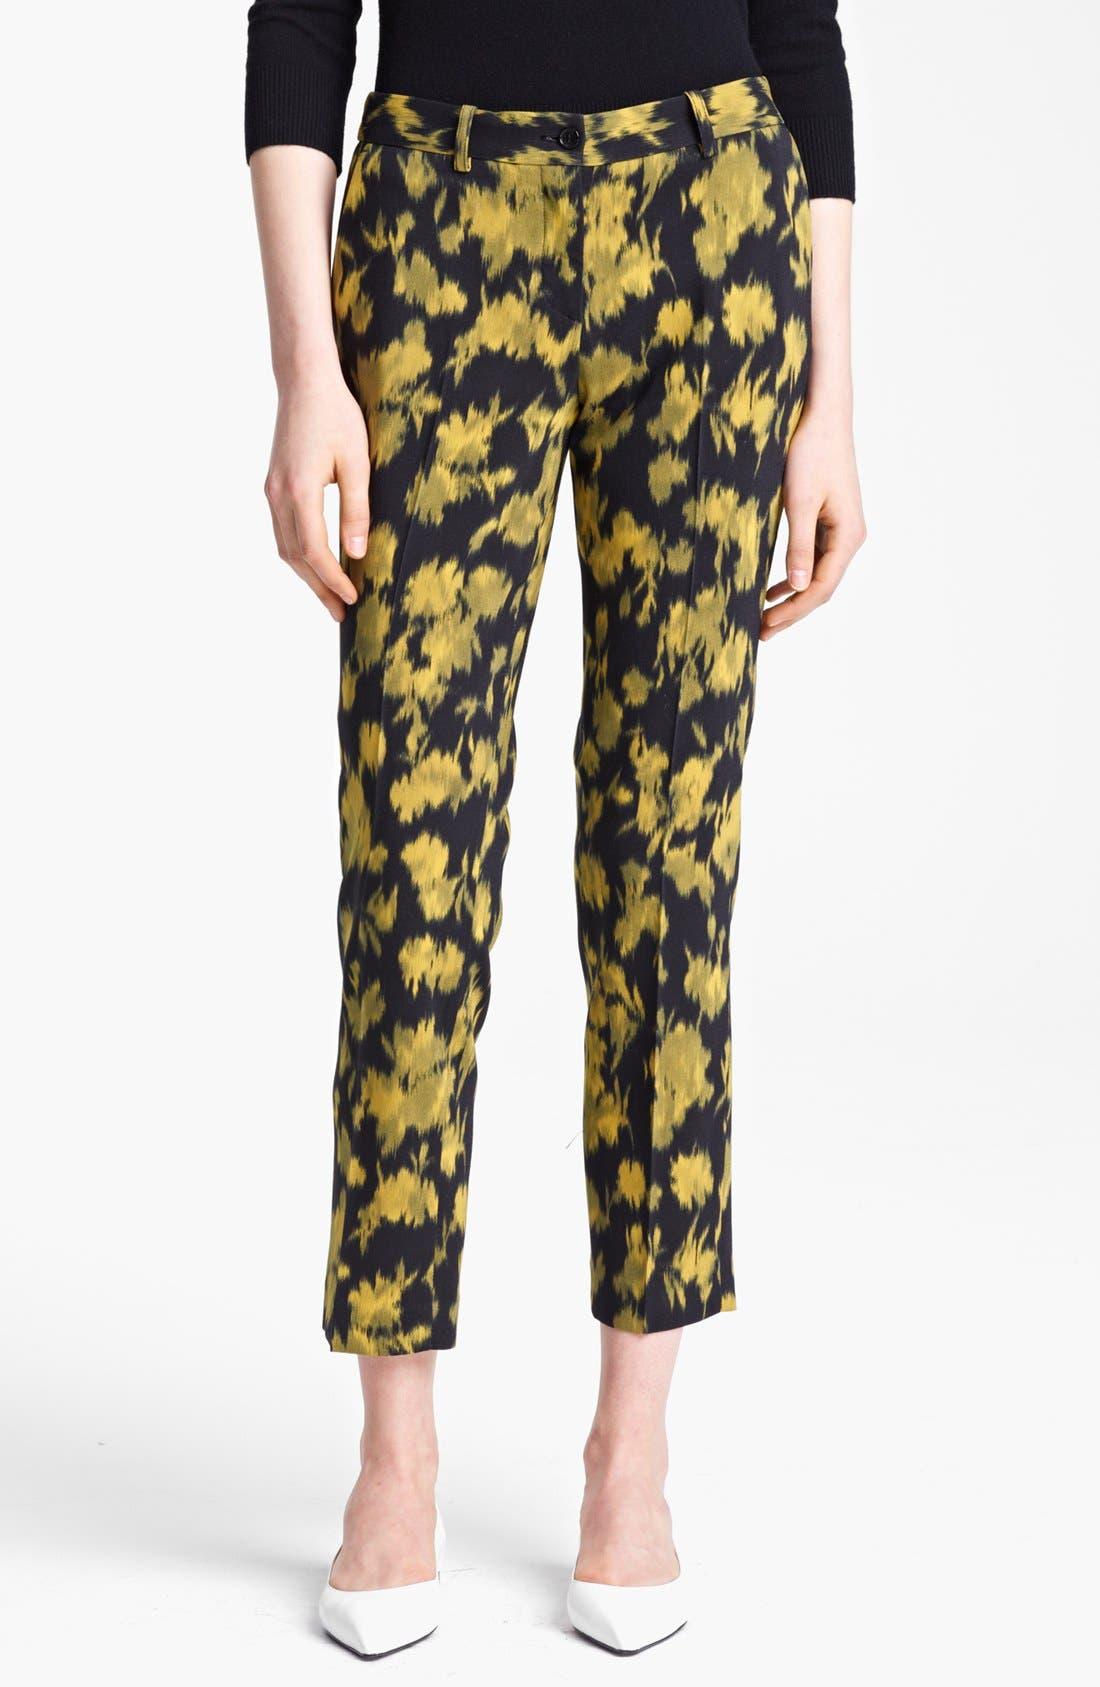 Alternate Image 1 Selected - Michael Kors 'Samantha' Print Skinny Stretch Wool Pants